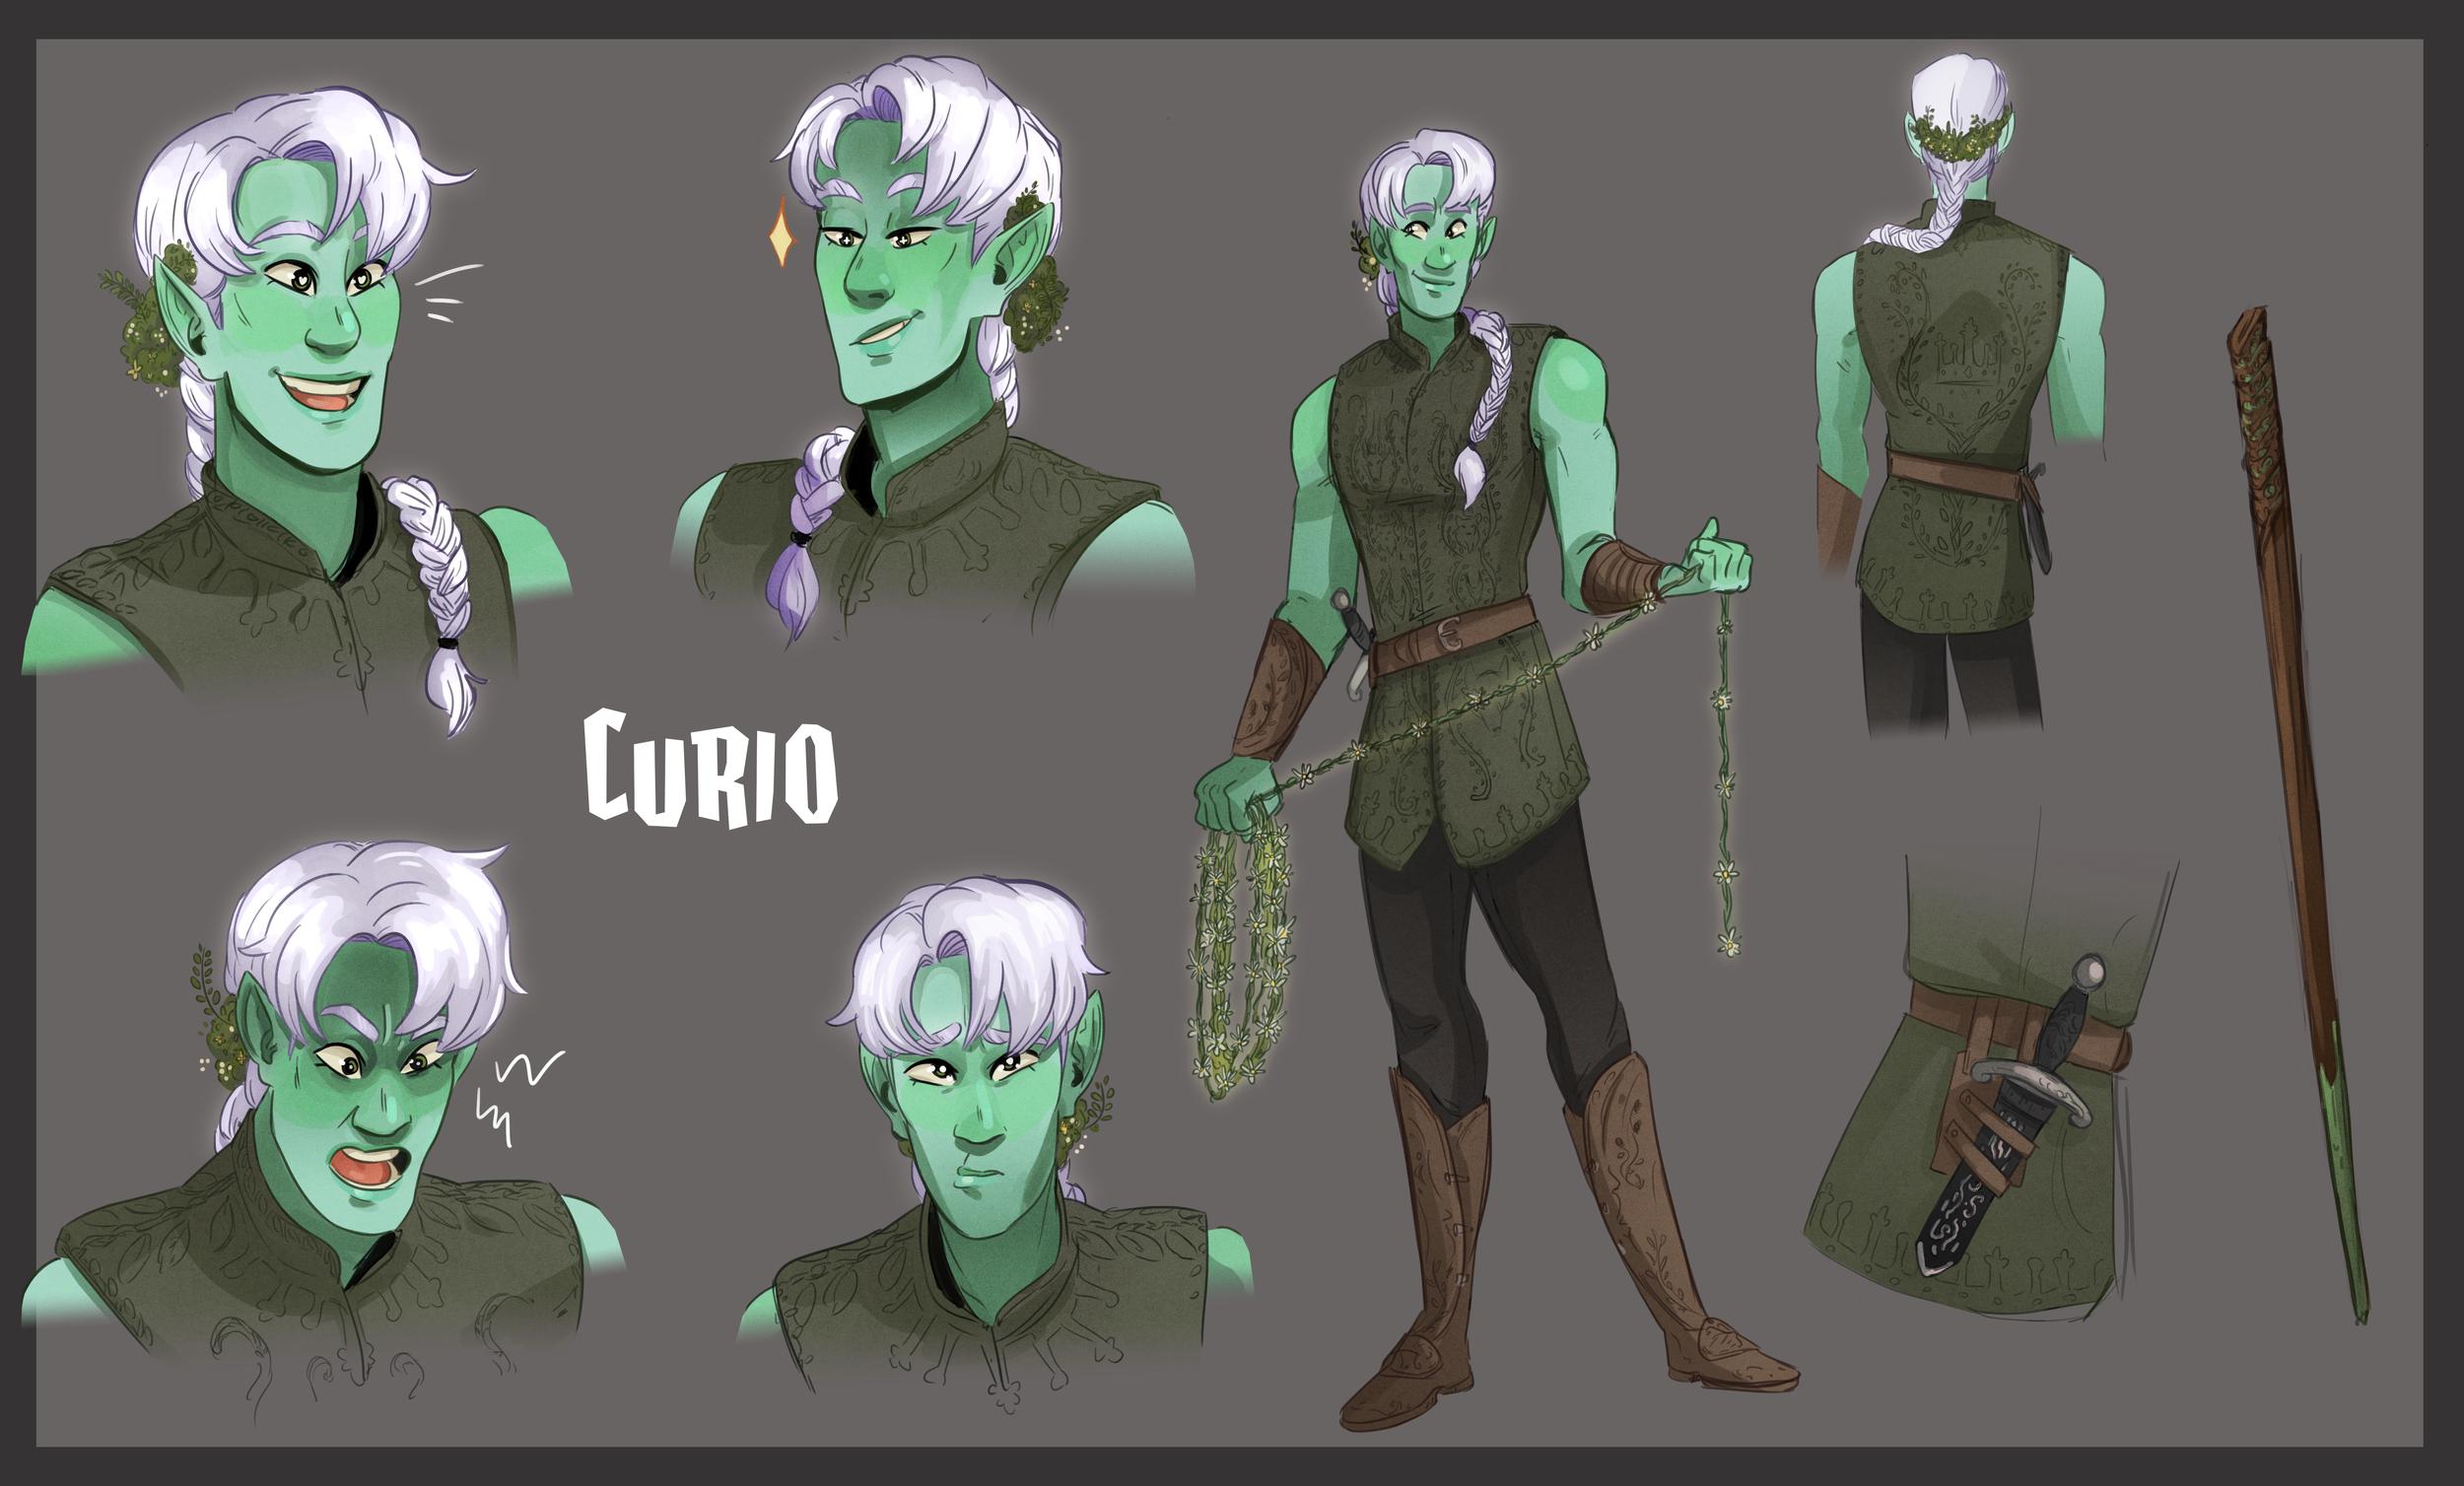 CURIO_CharacterSheet_Brows.png